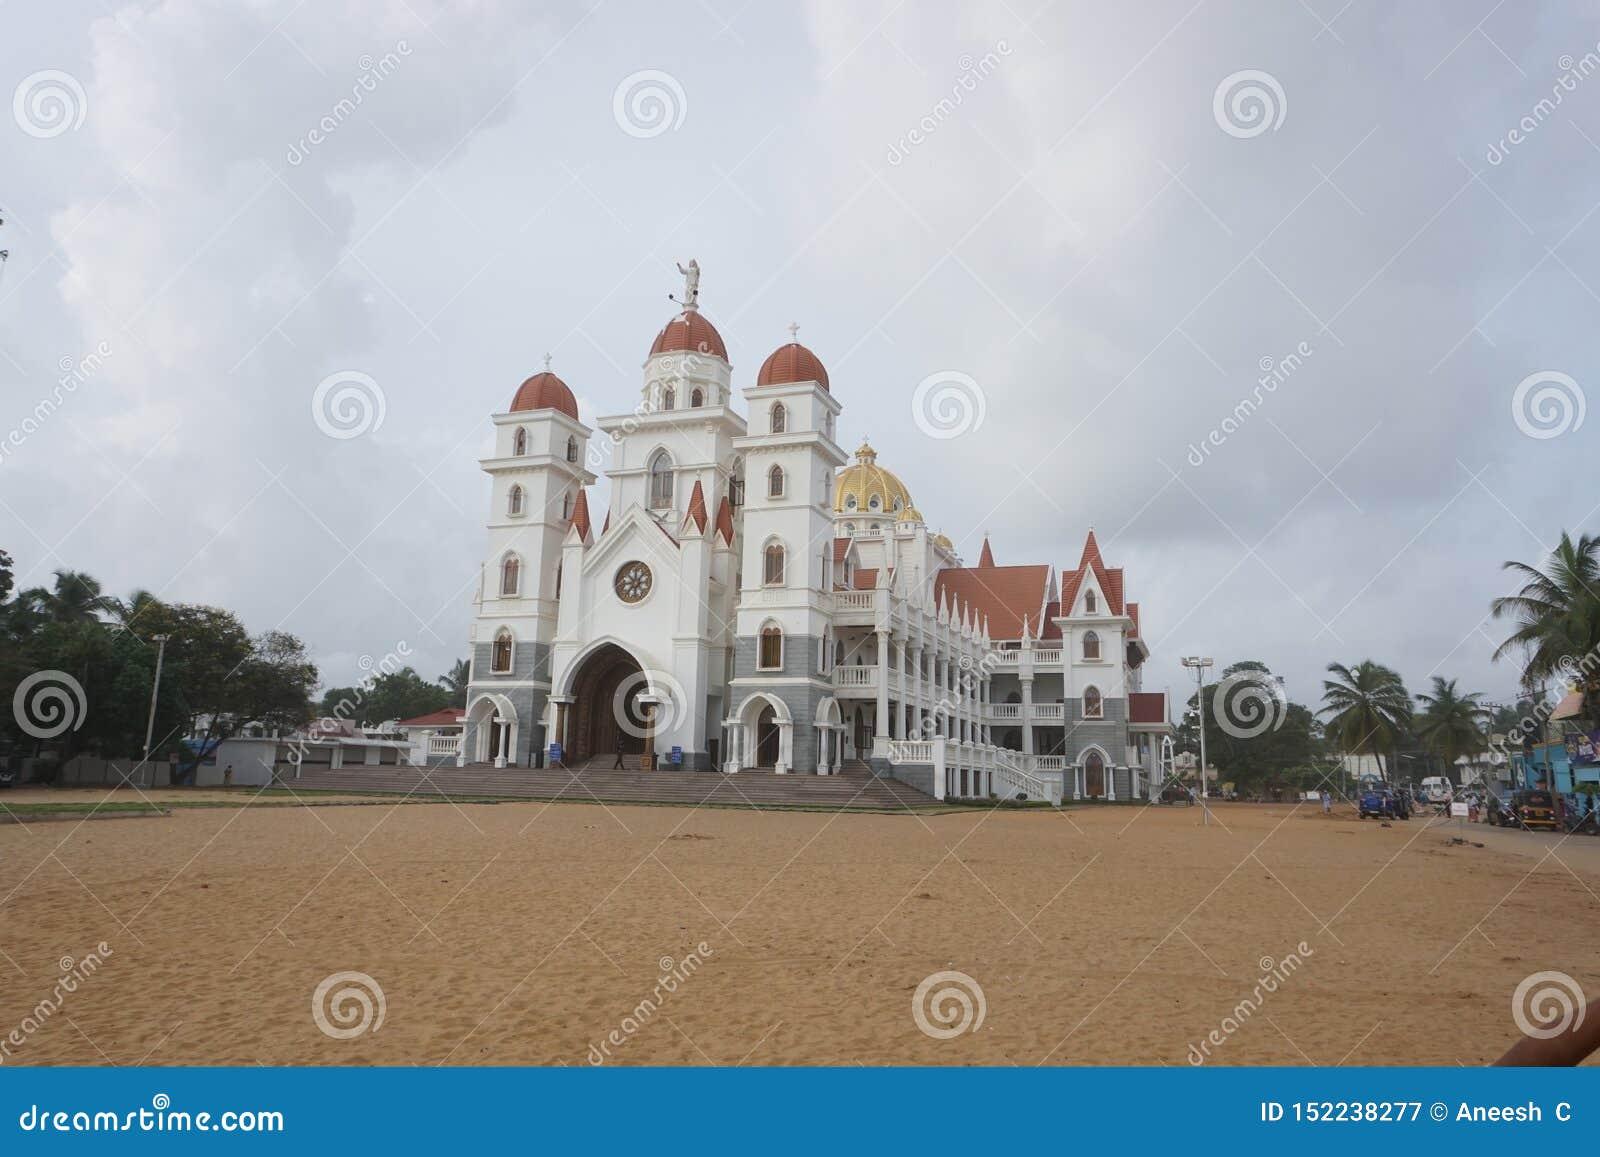 Mother of God Church, Vettukad